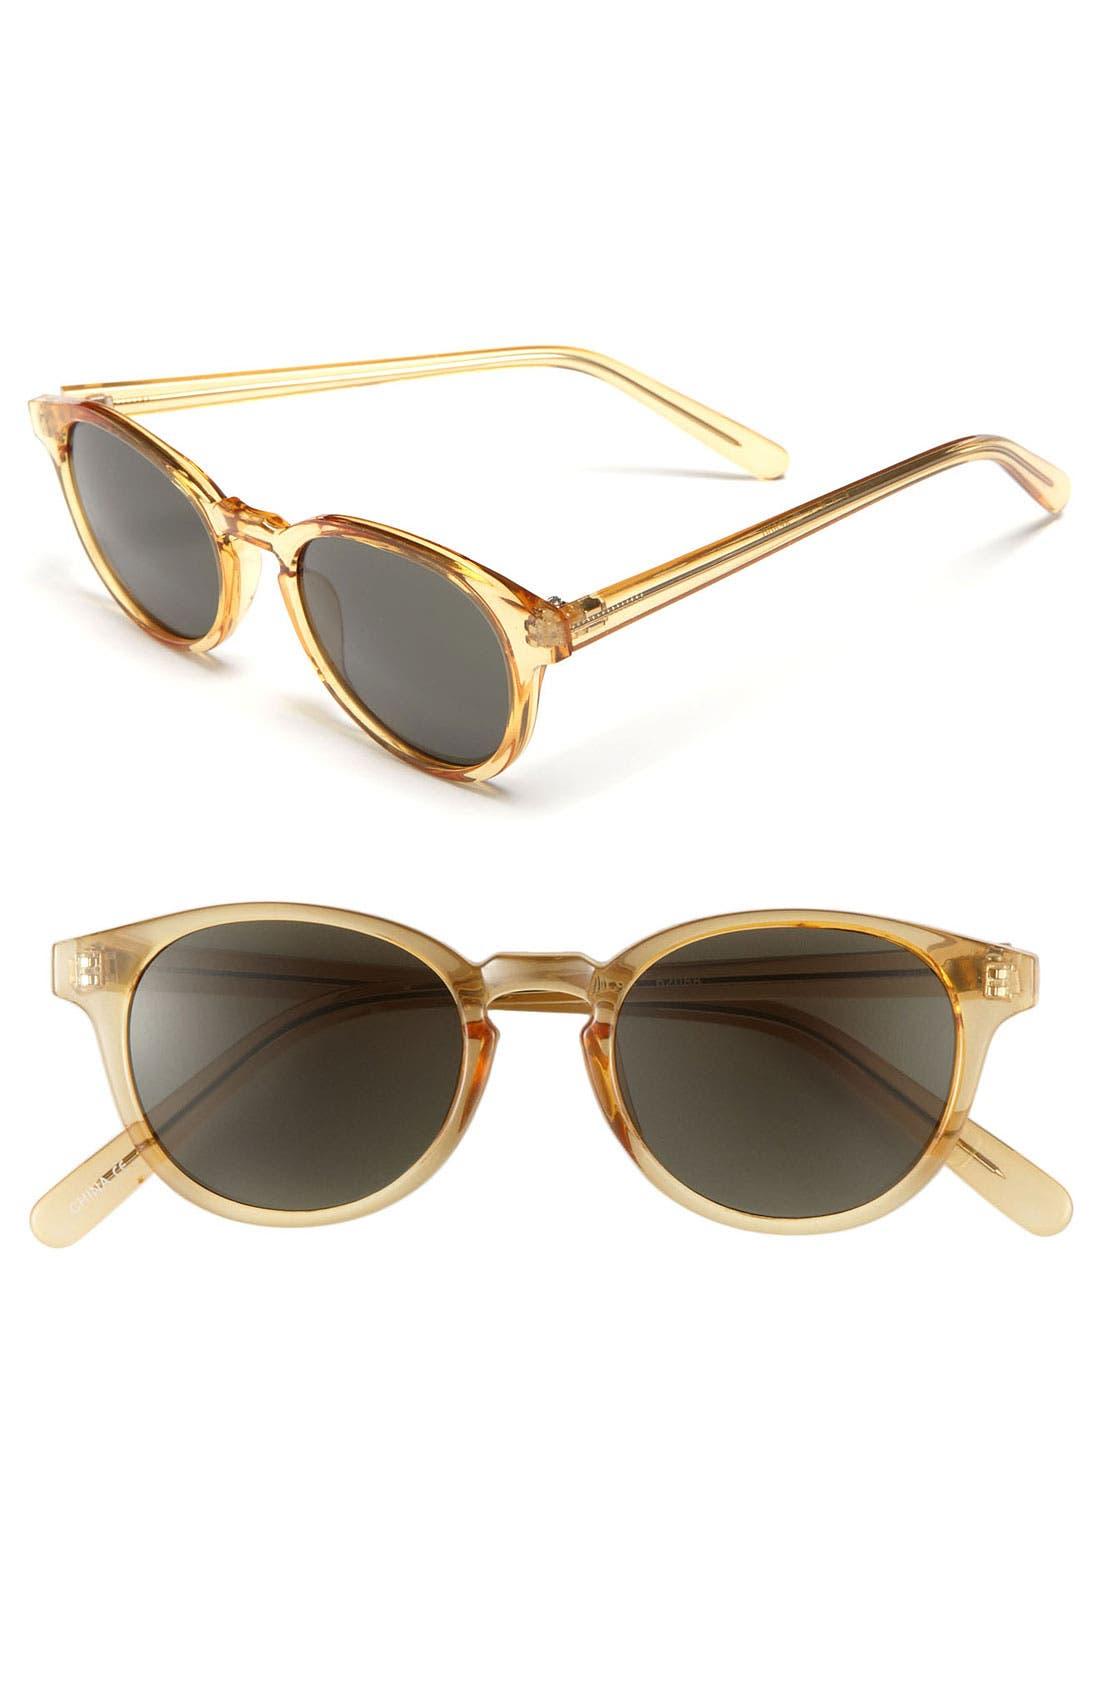 Main Image - A.J. Morgan 'Boston' Sunglasses